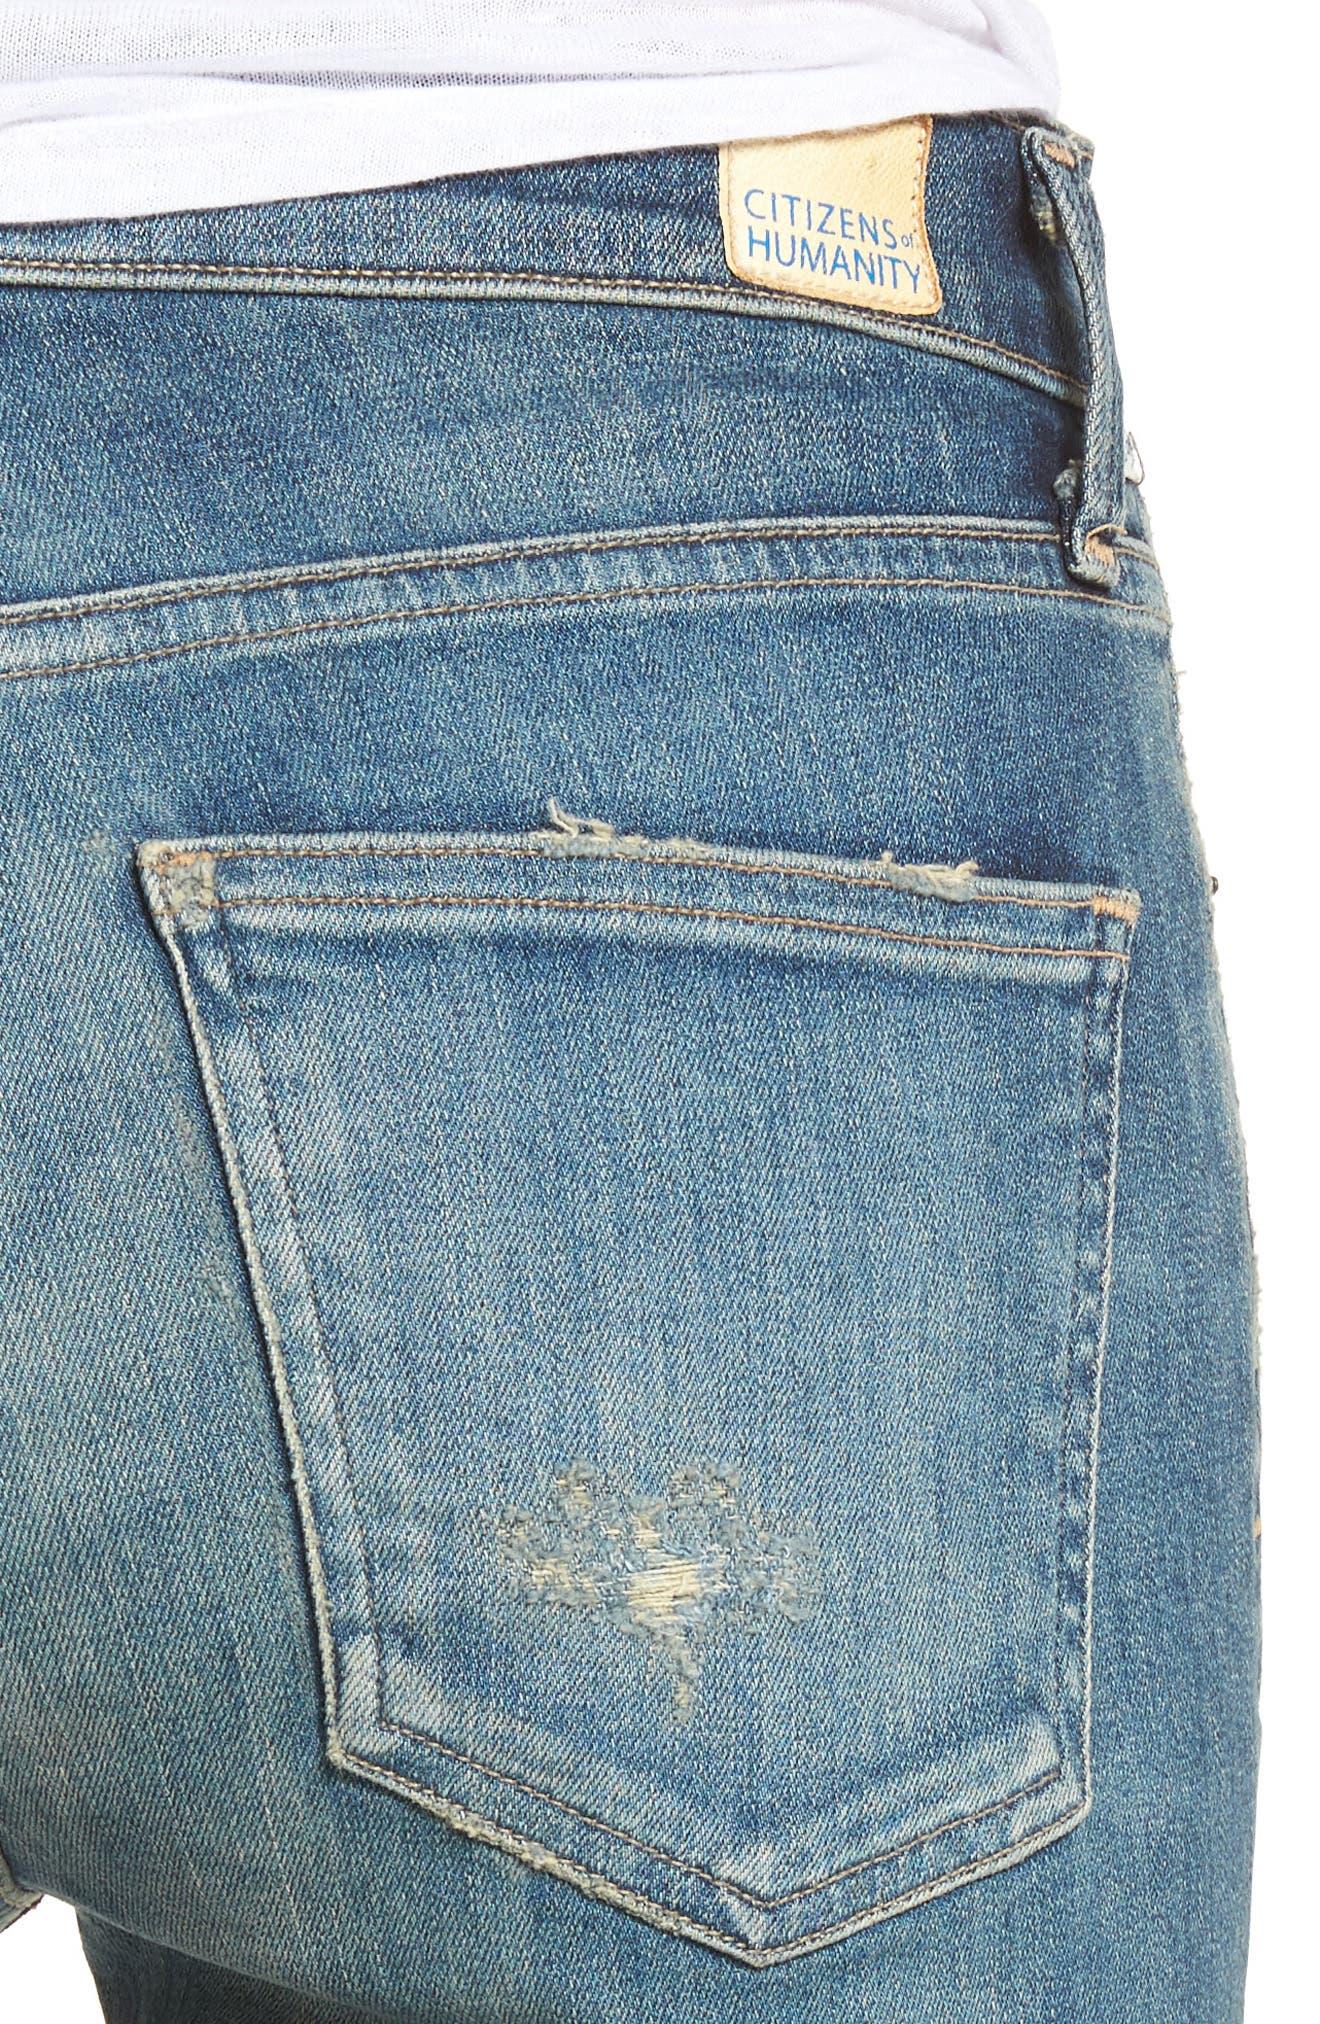 Rocket High Waist Skinny Jeans,                             Alternate thumbnail 4, color,                             465